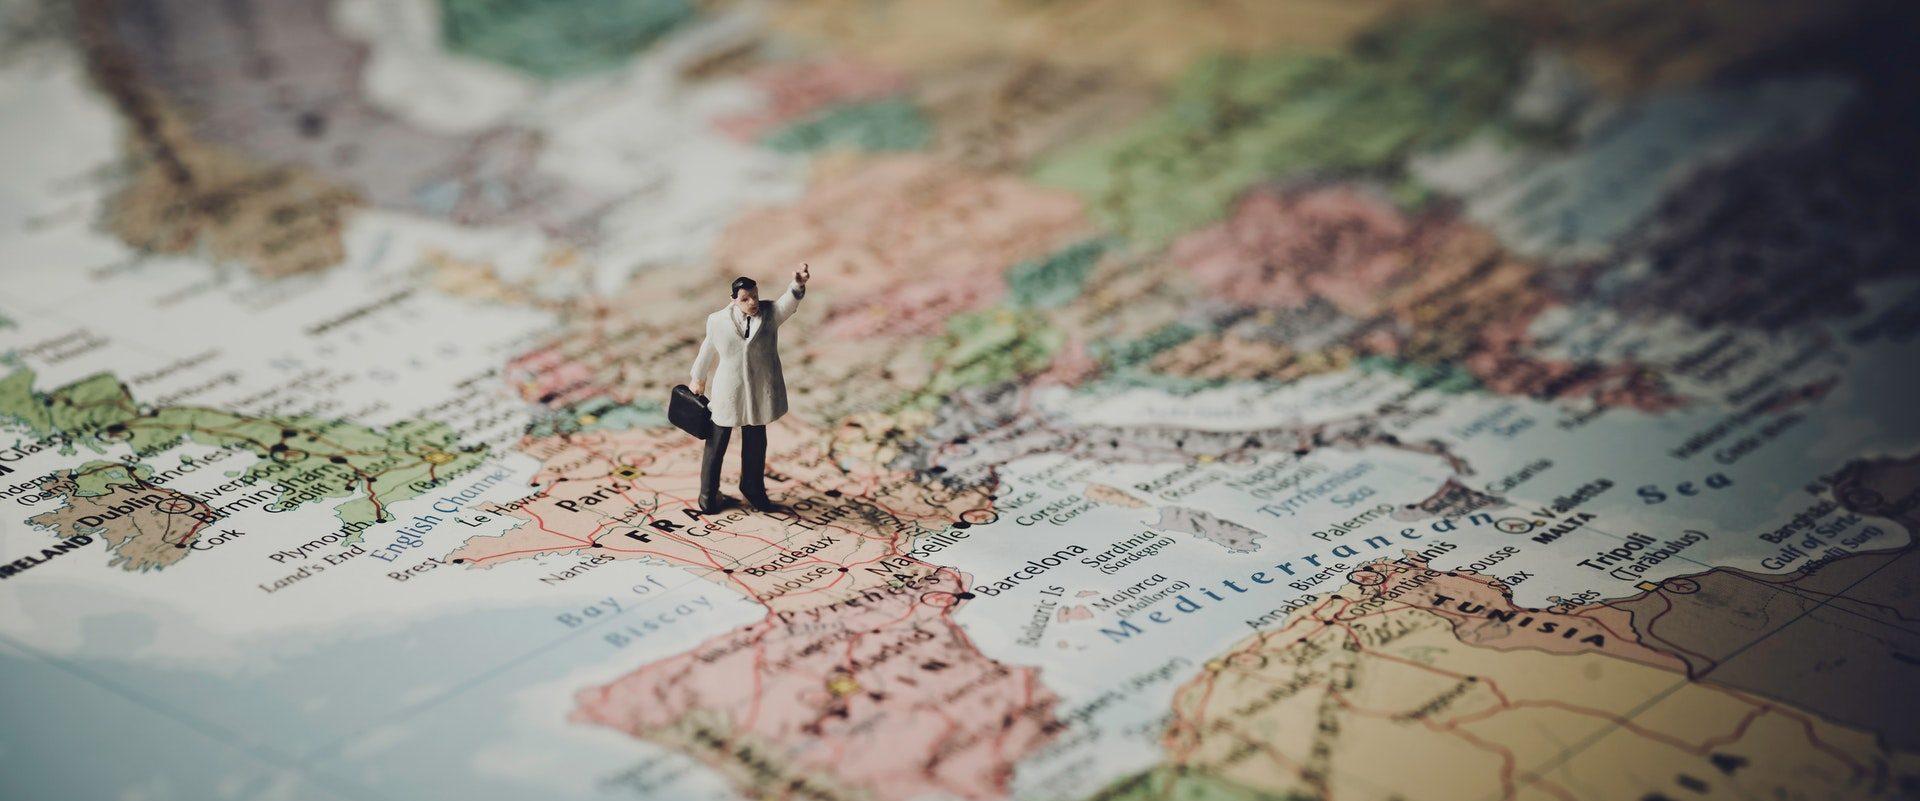 Help map the UK's research landscape. pexels